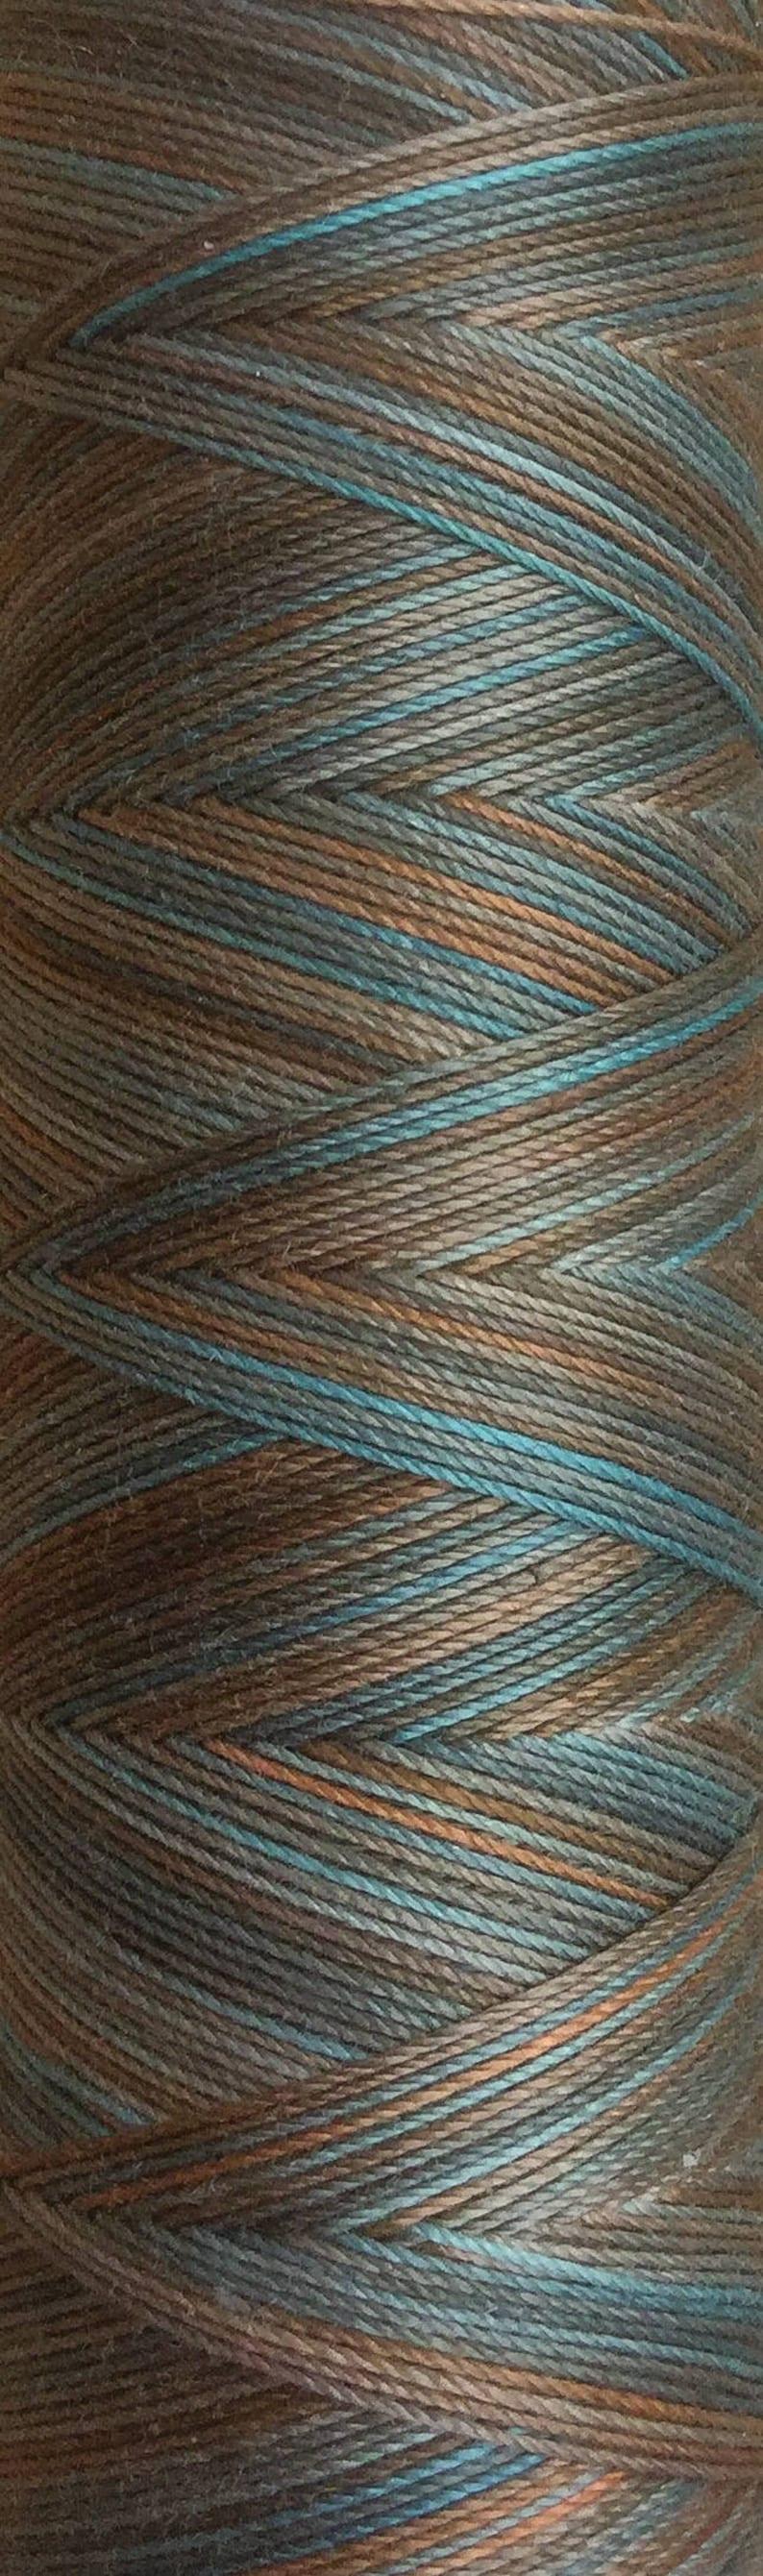 No.21 Rust Hand Dyed Cotton Machine Thread Individual Spool image 0